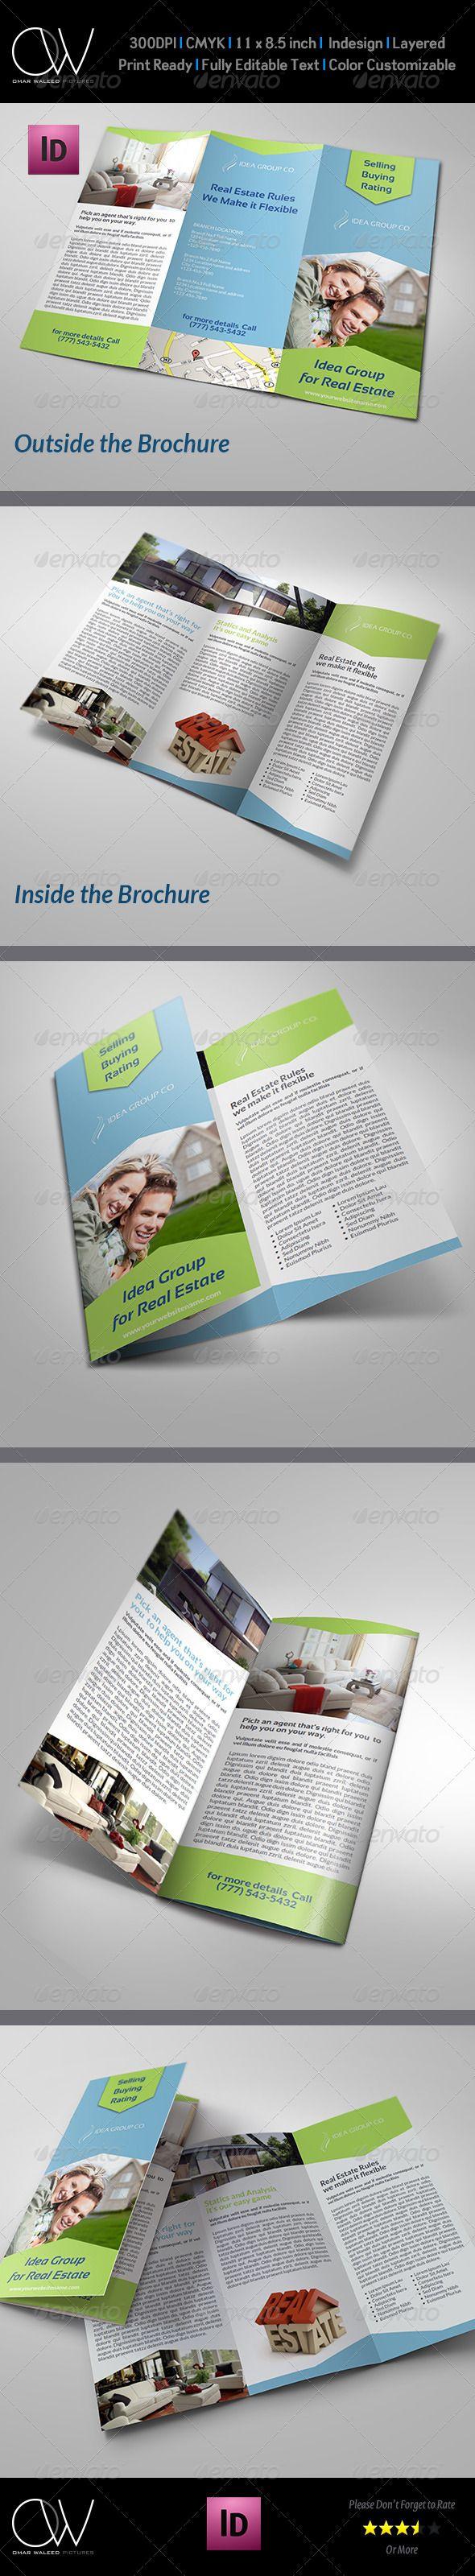 Best Brochure TriFold Images On Pinterest Tri Fold Brochure - Tri fold brochure template indesign